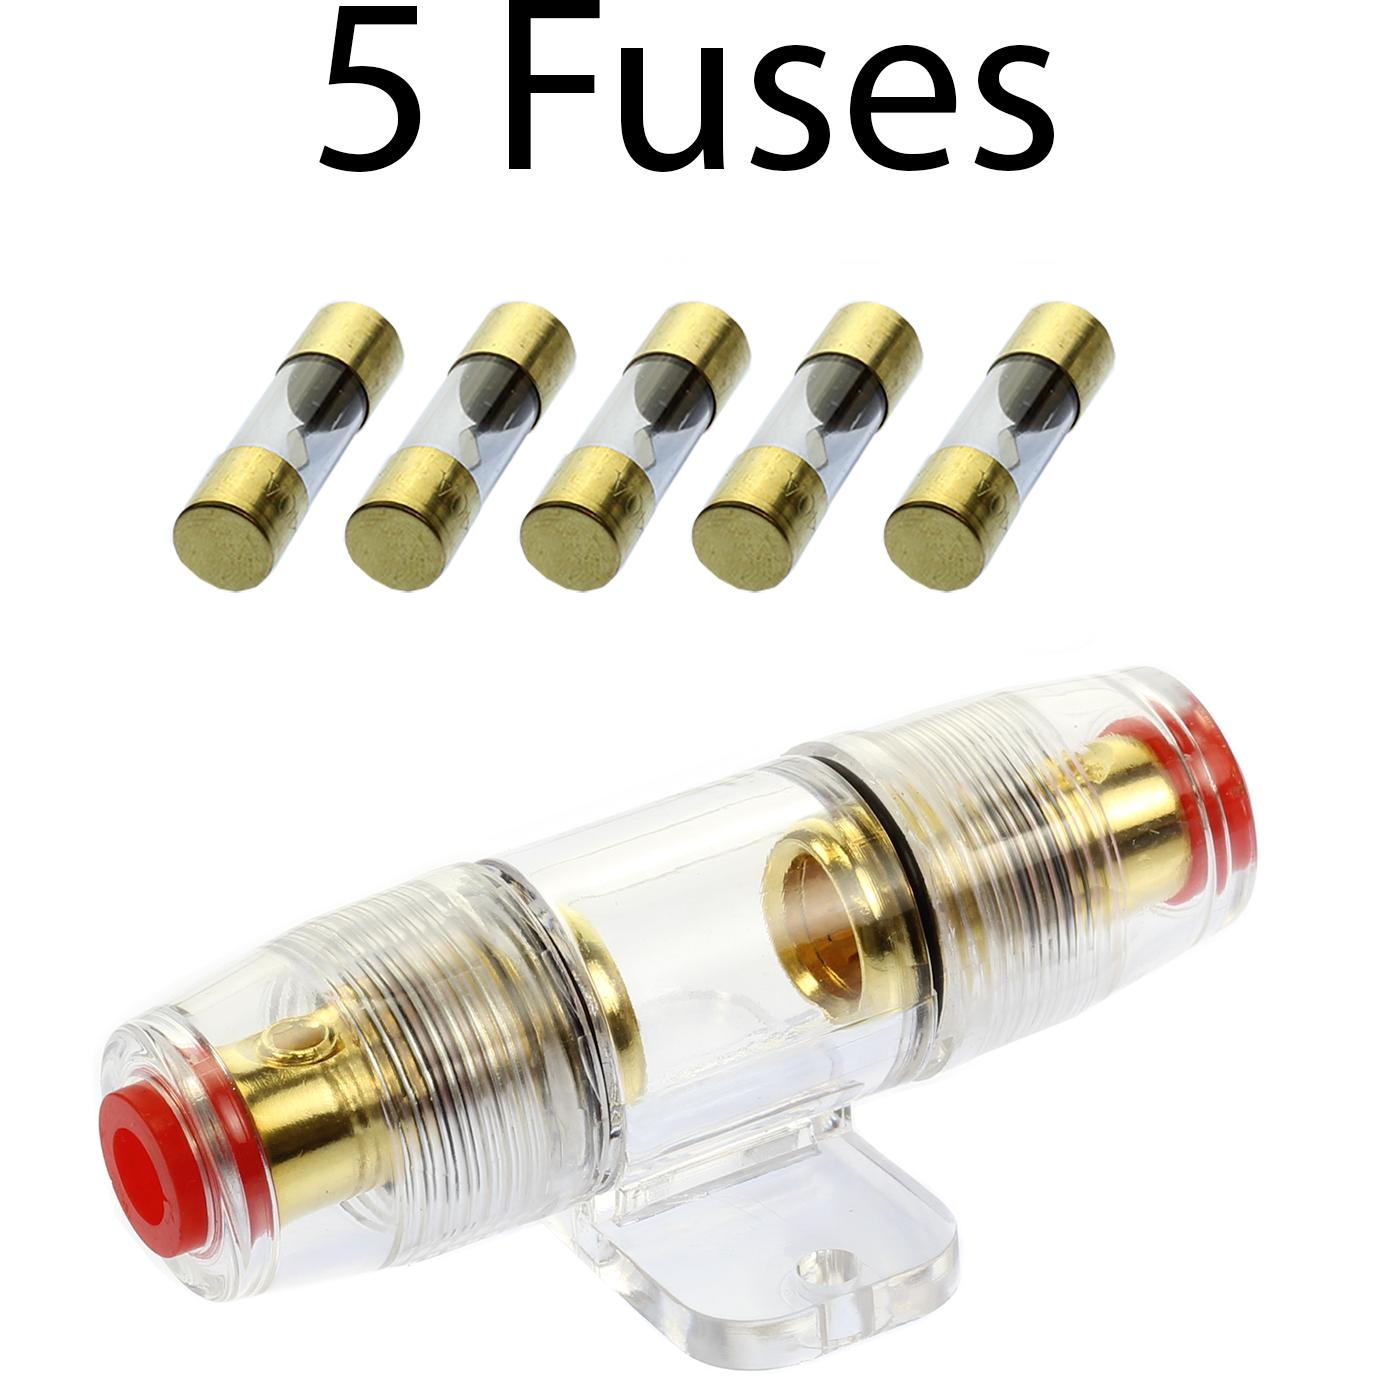 AGU Fuse Holder High Quality Gold Inline 4 6 8 Gauge 5 Pack 40 AMP AGU Fuses